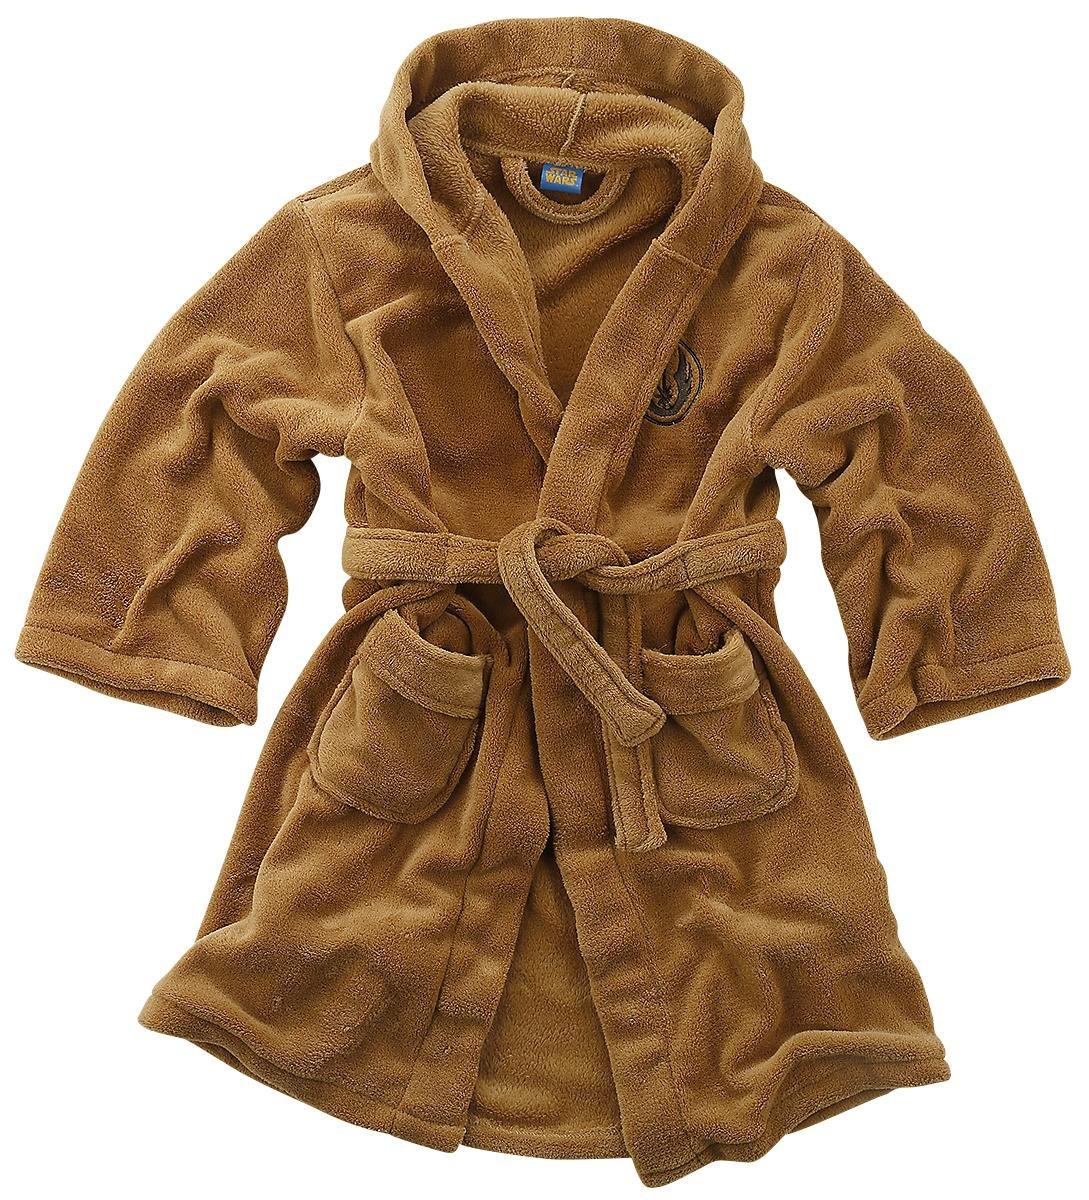 Star Wars Jedi Knight Childrens Dressing Gown Bathrobe